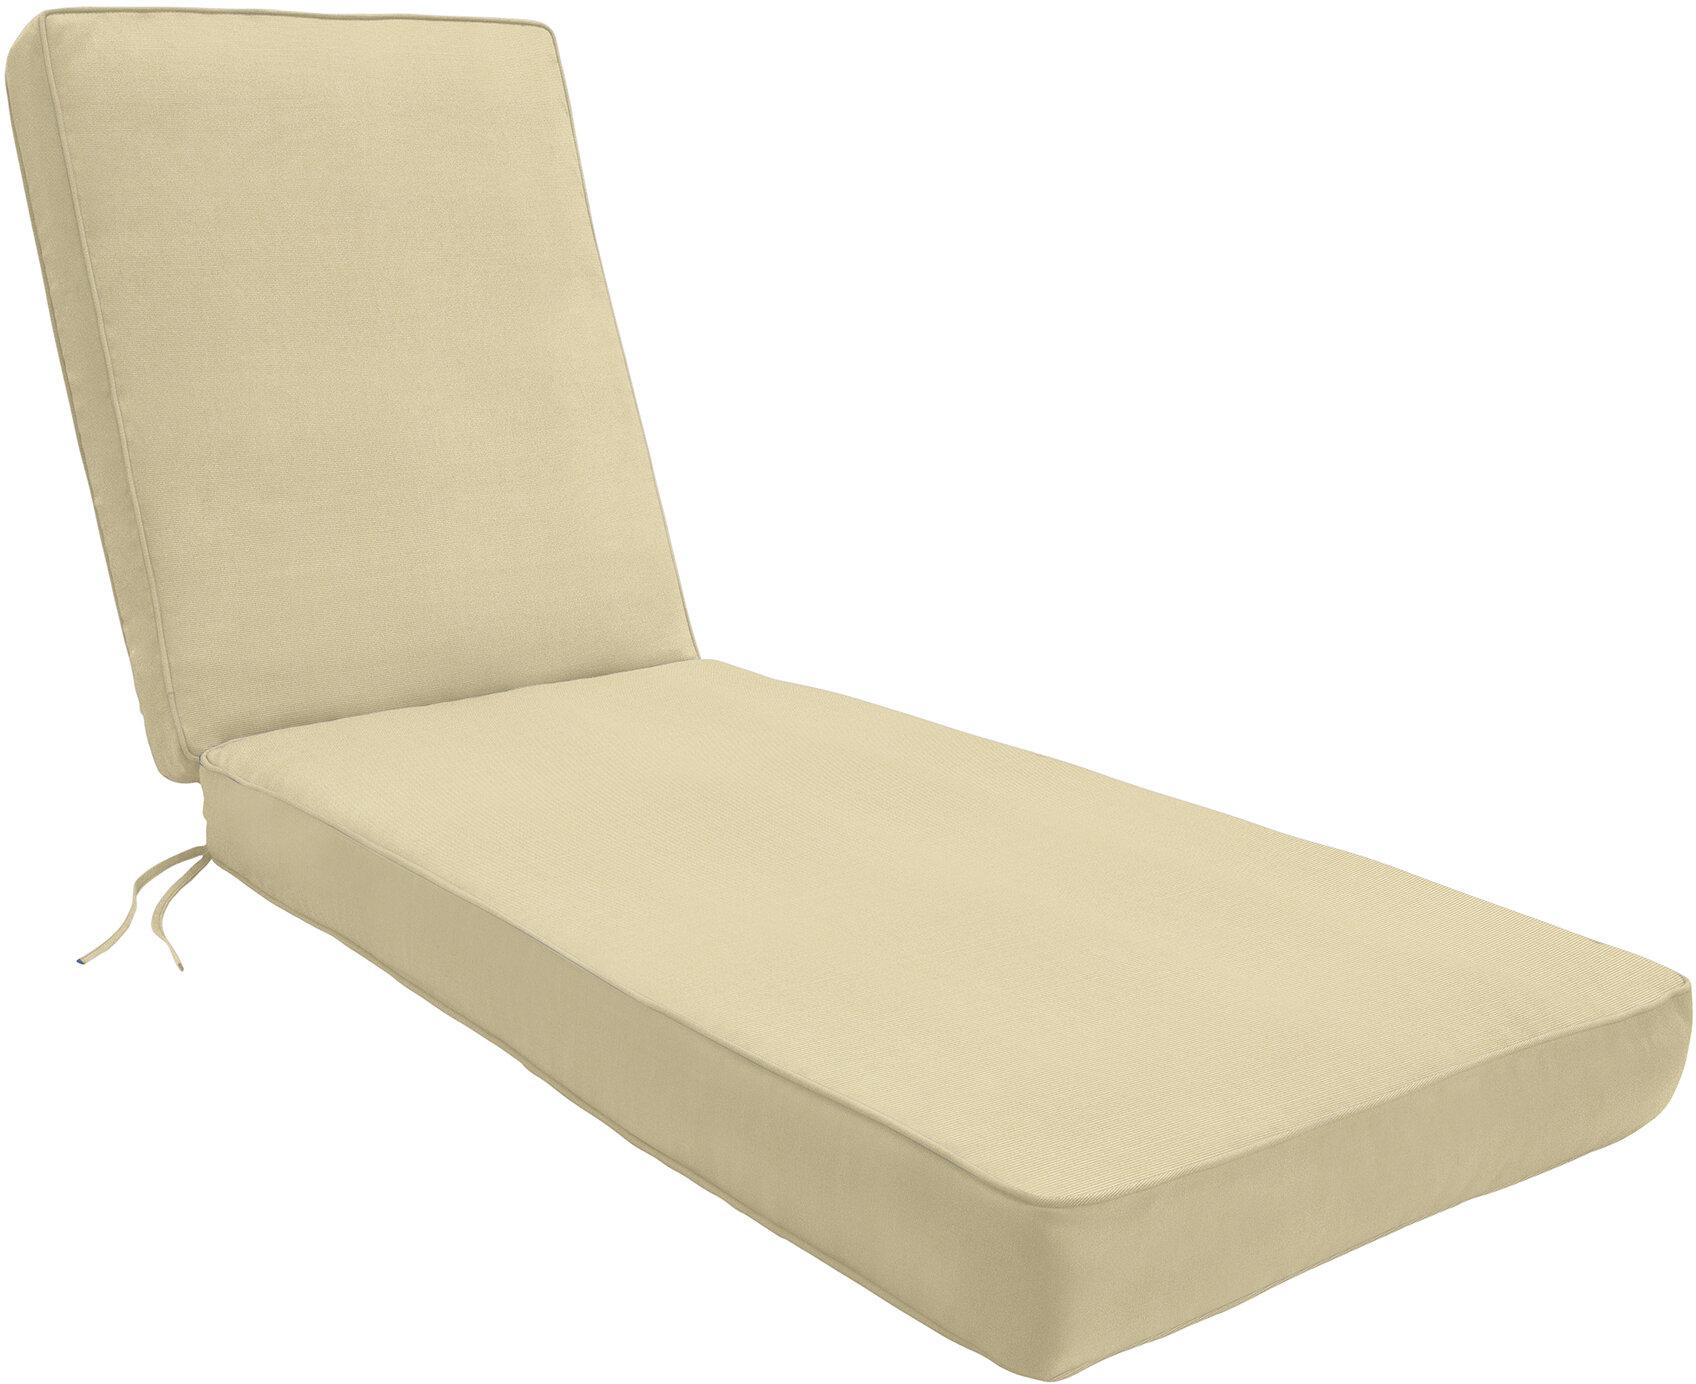 Wayfair Custom Outdoor Cushions Indoor Outdoor Sunbrella Chaise